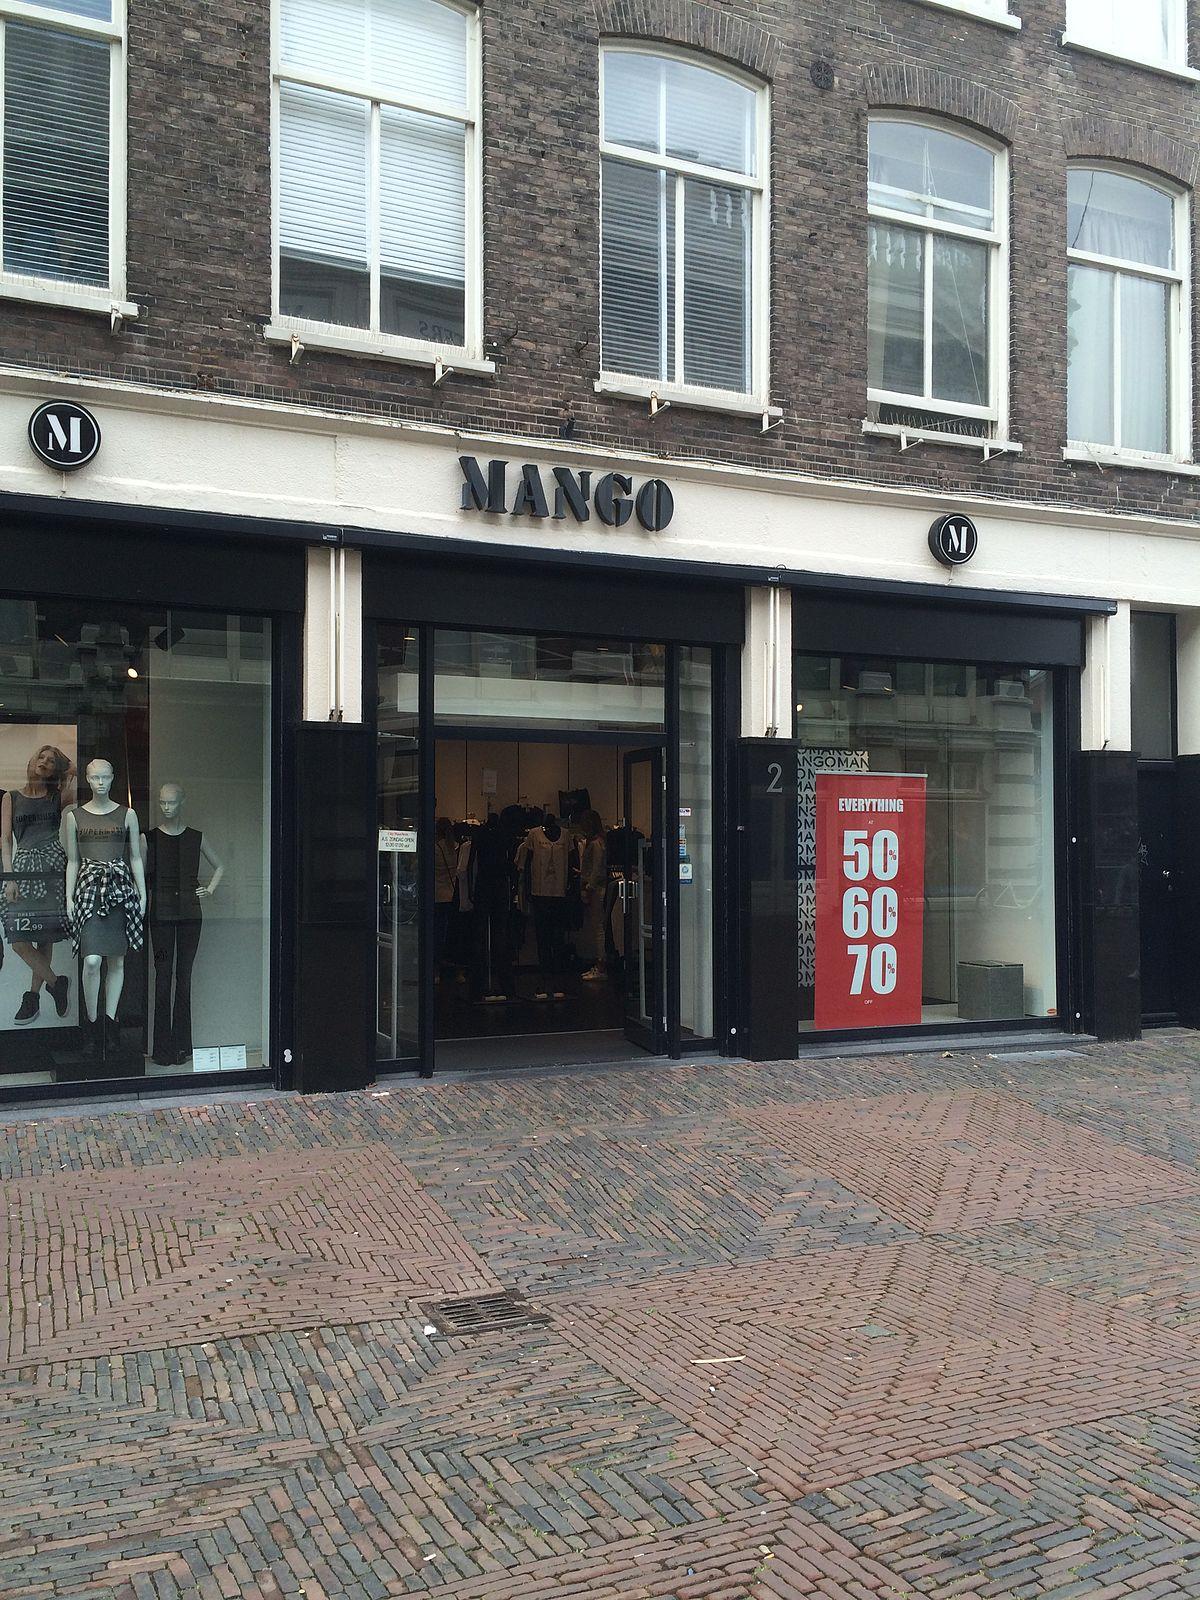 Mango (retailer) - Wikipedia